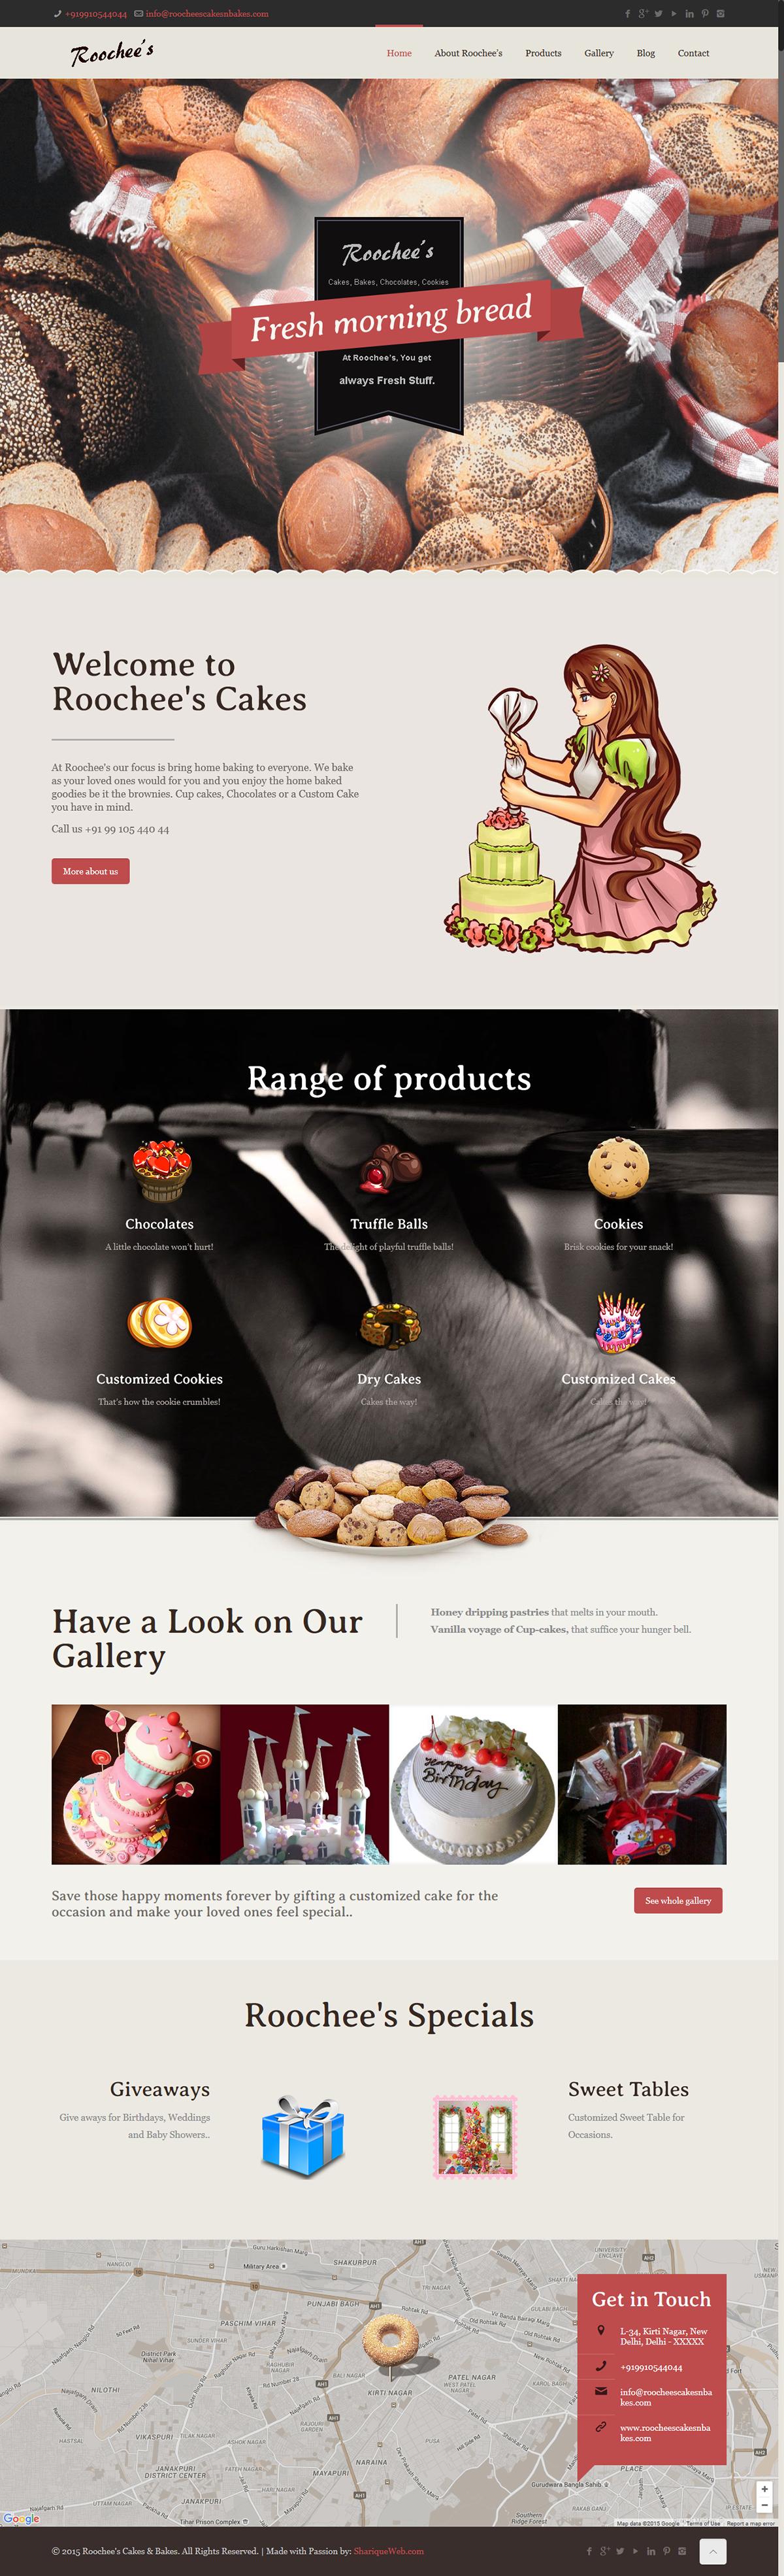 cake shop Wordpress Website Roochee's Cakes